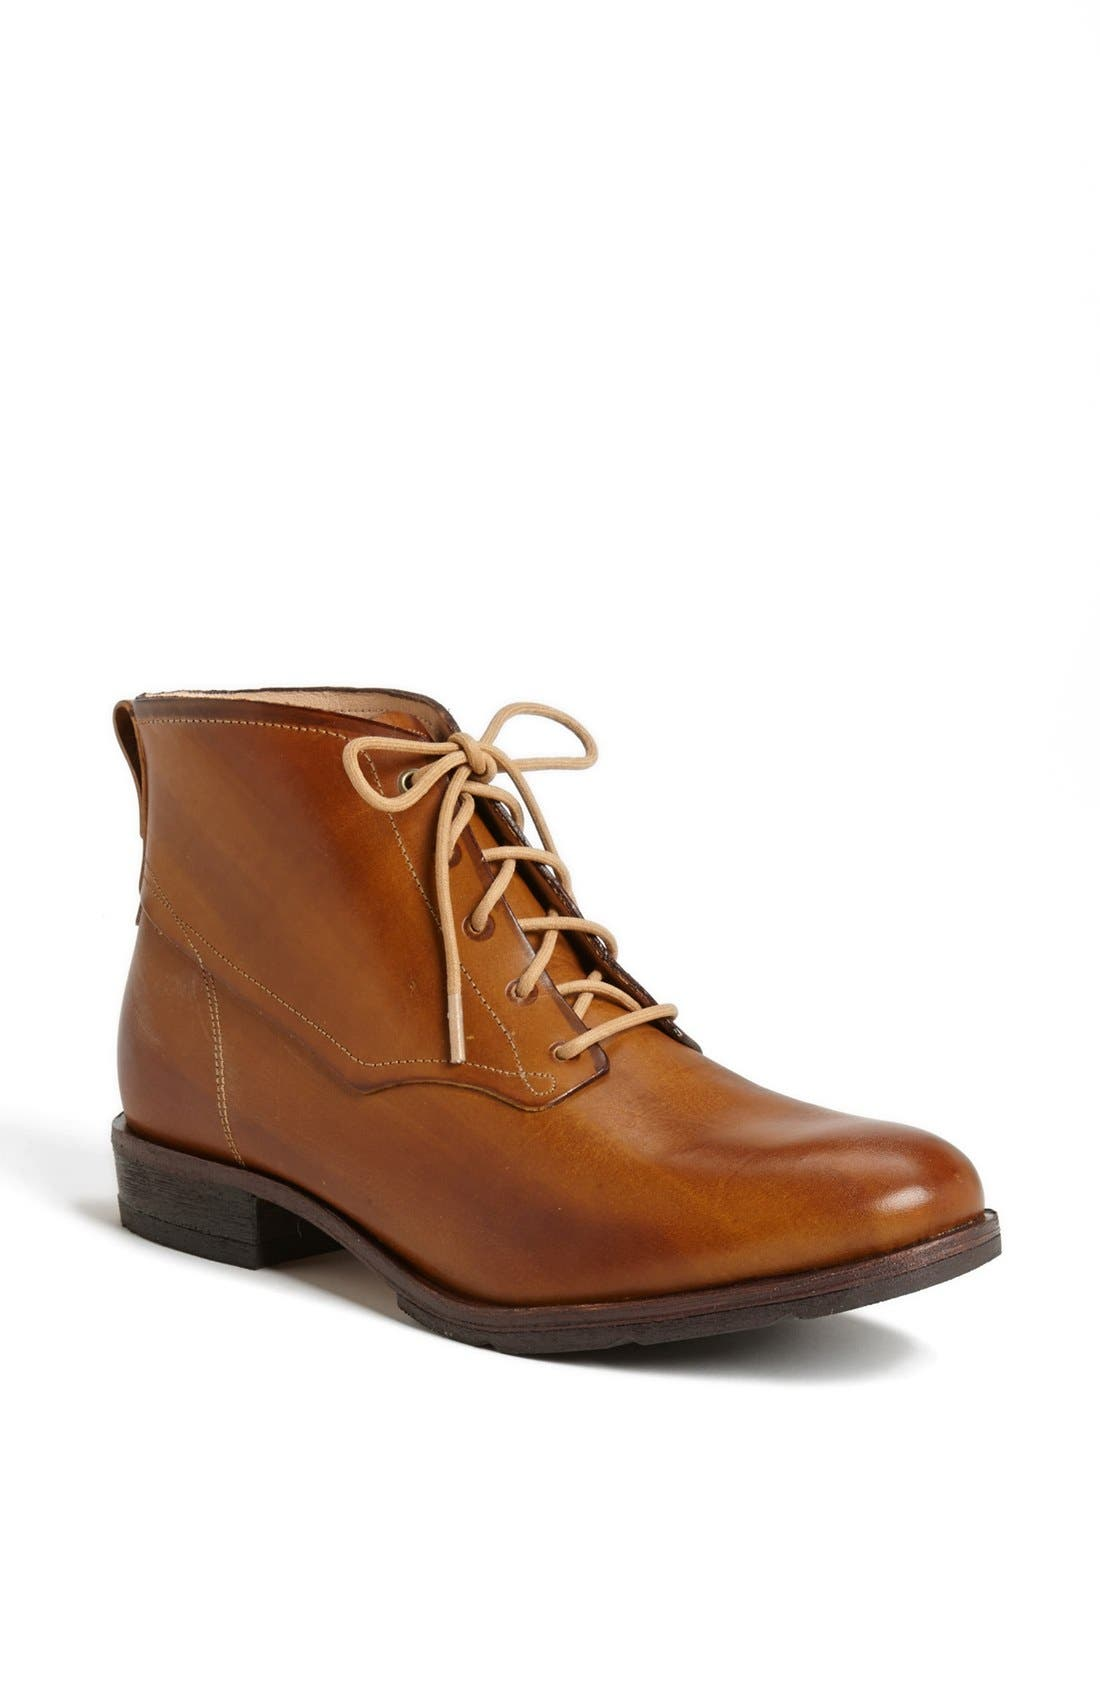 Main Image - Timberland 'Lucille' Chukka Boot